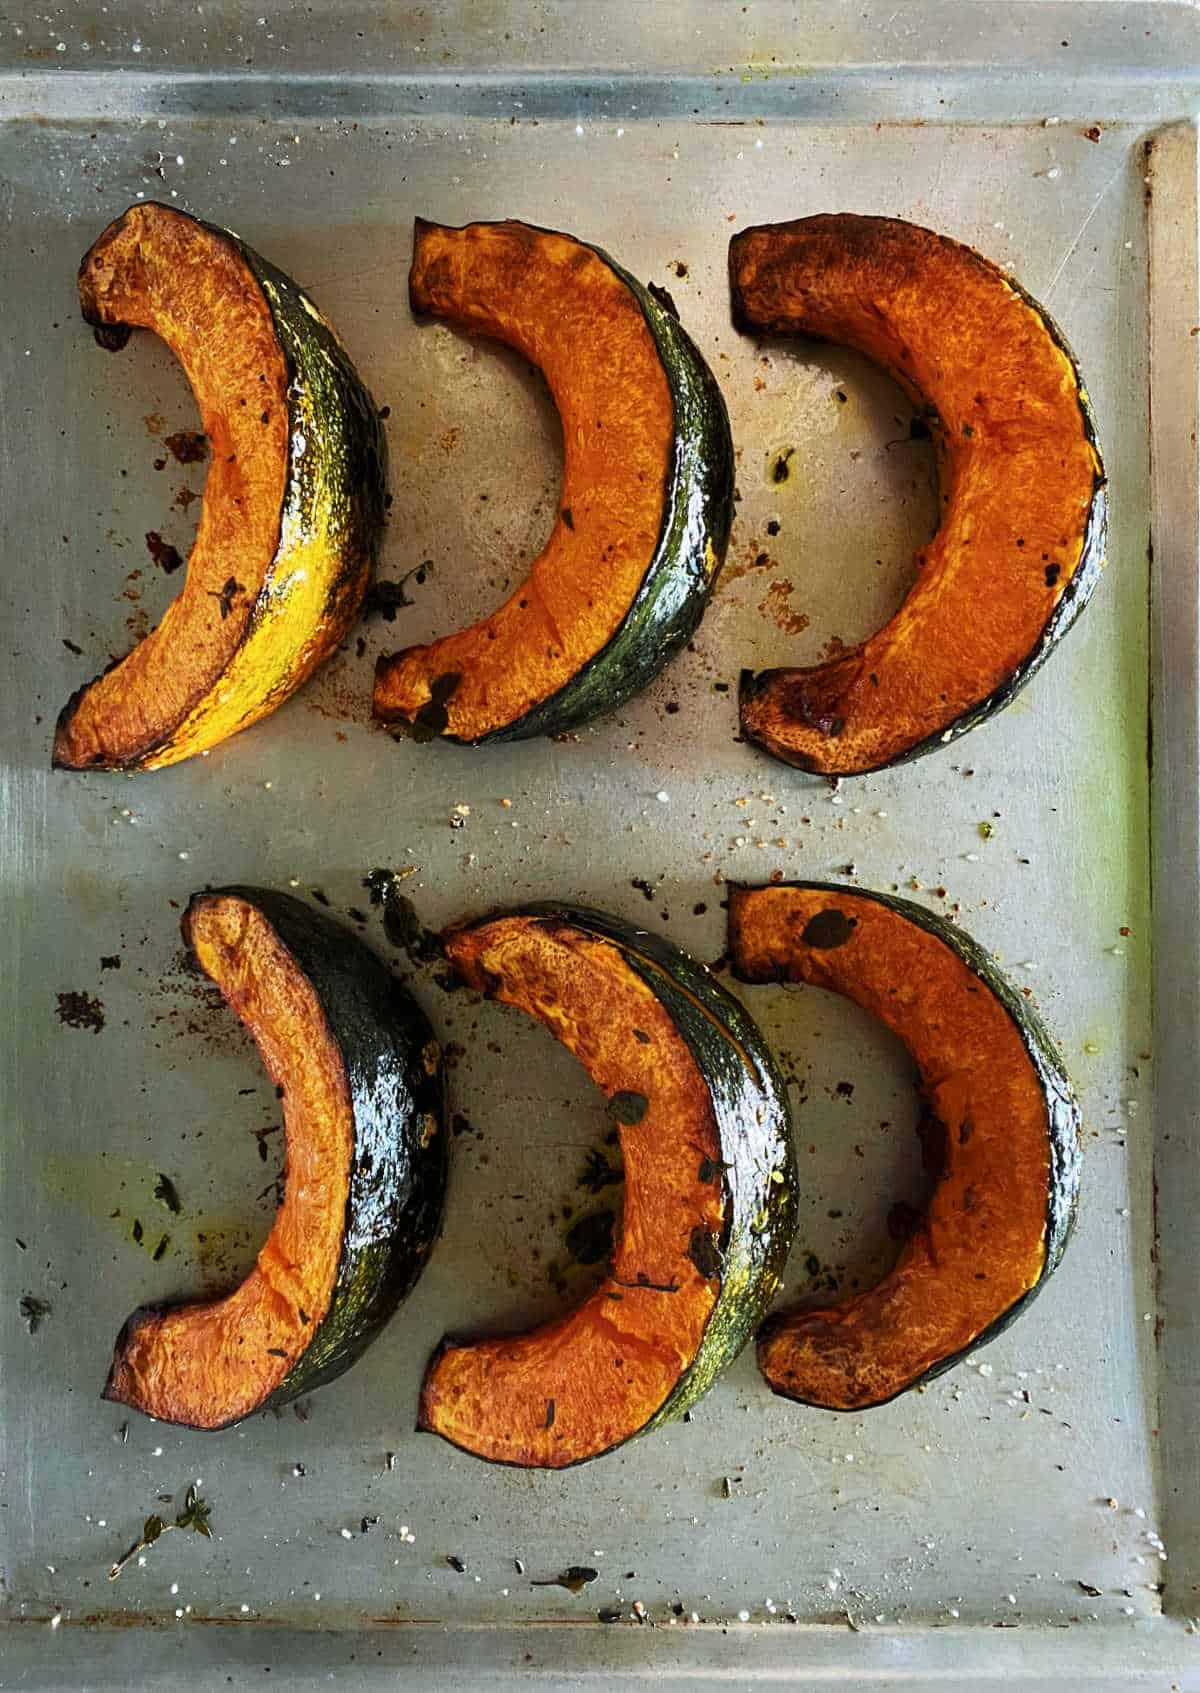 Six baked pumpkin wedges on metal baking sheet